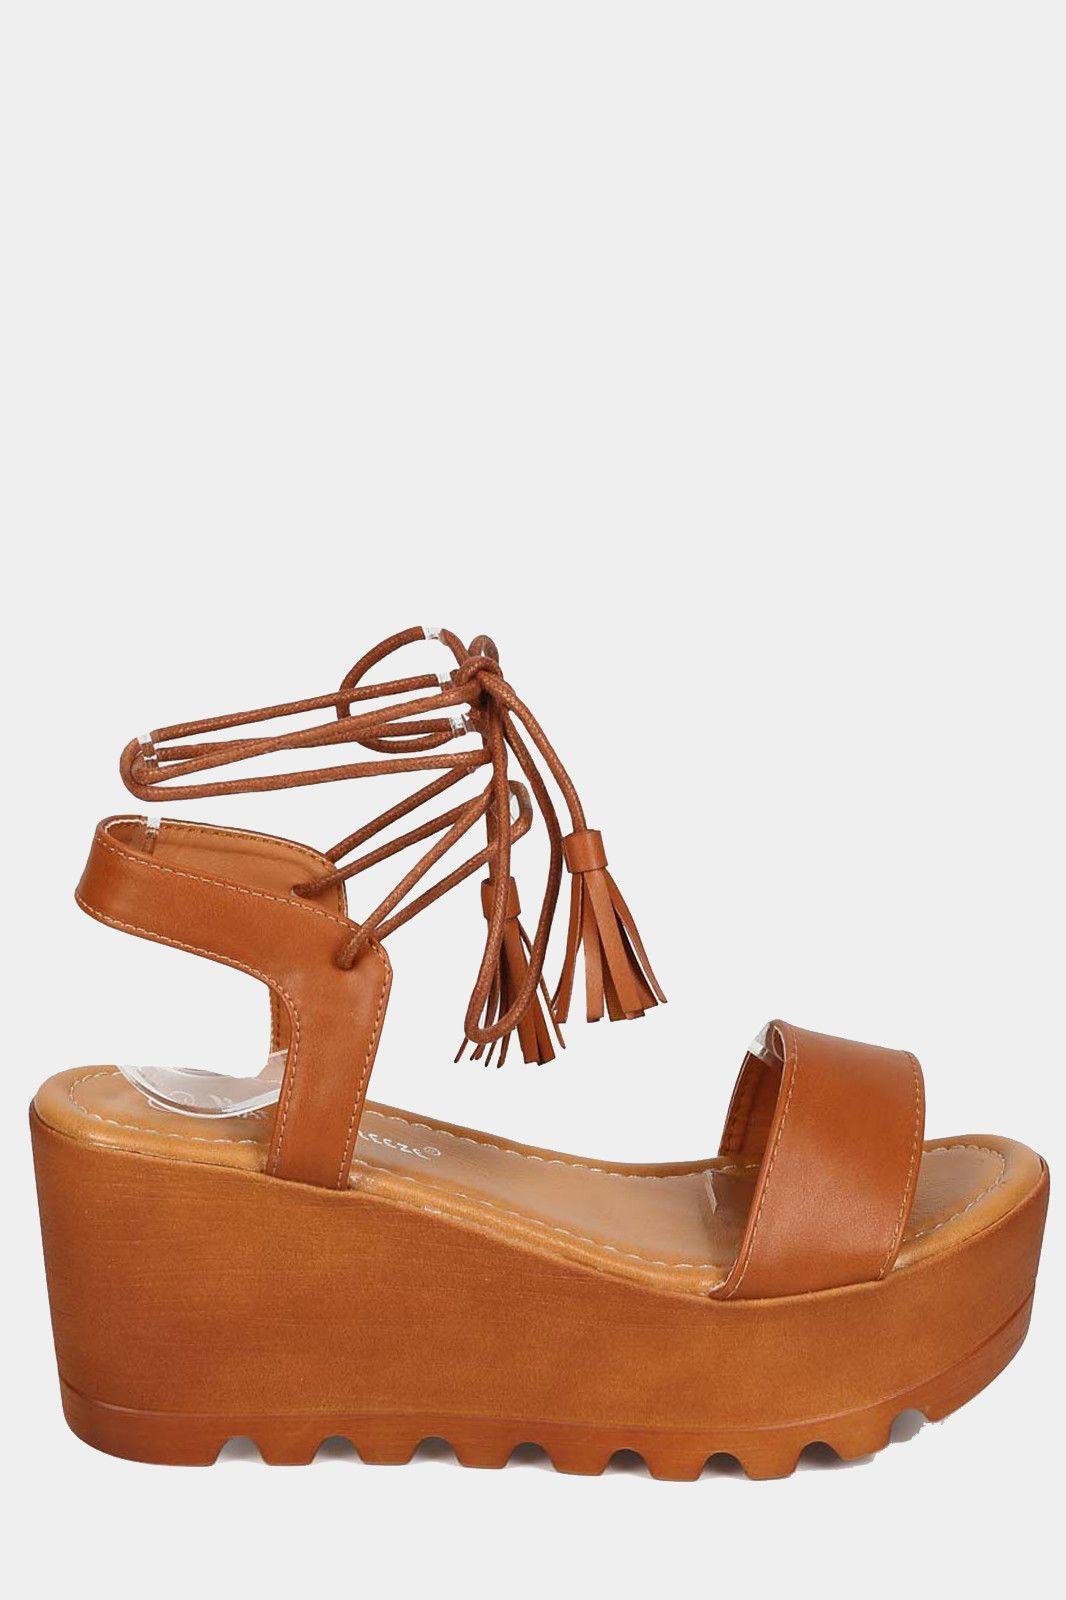 0bb41c59a18 Wrap Wooden Platform Wedge Sandals - Tan More